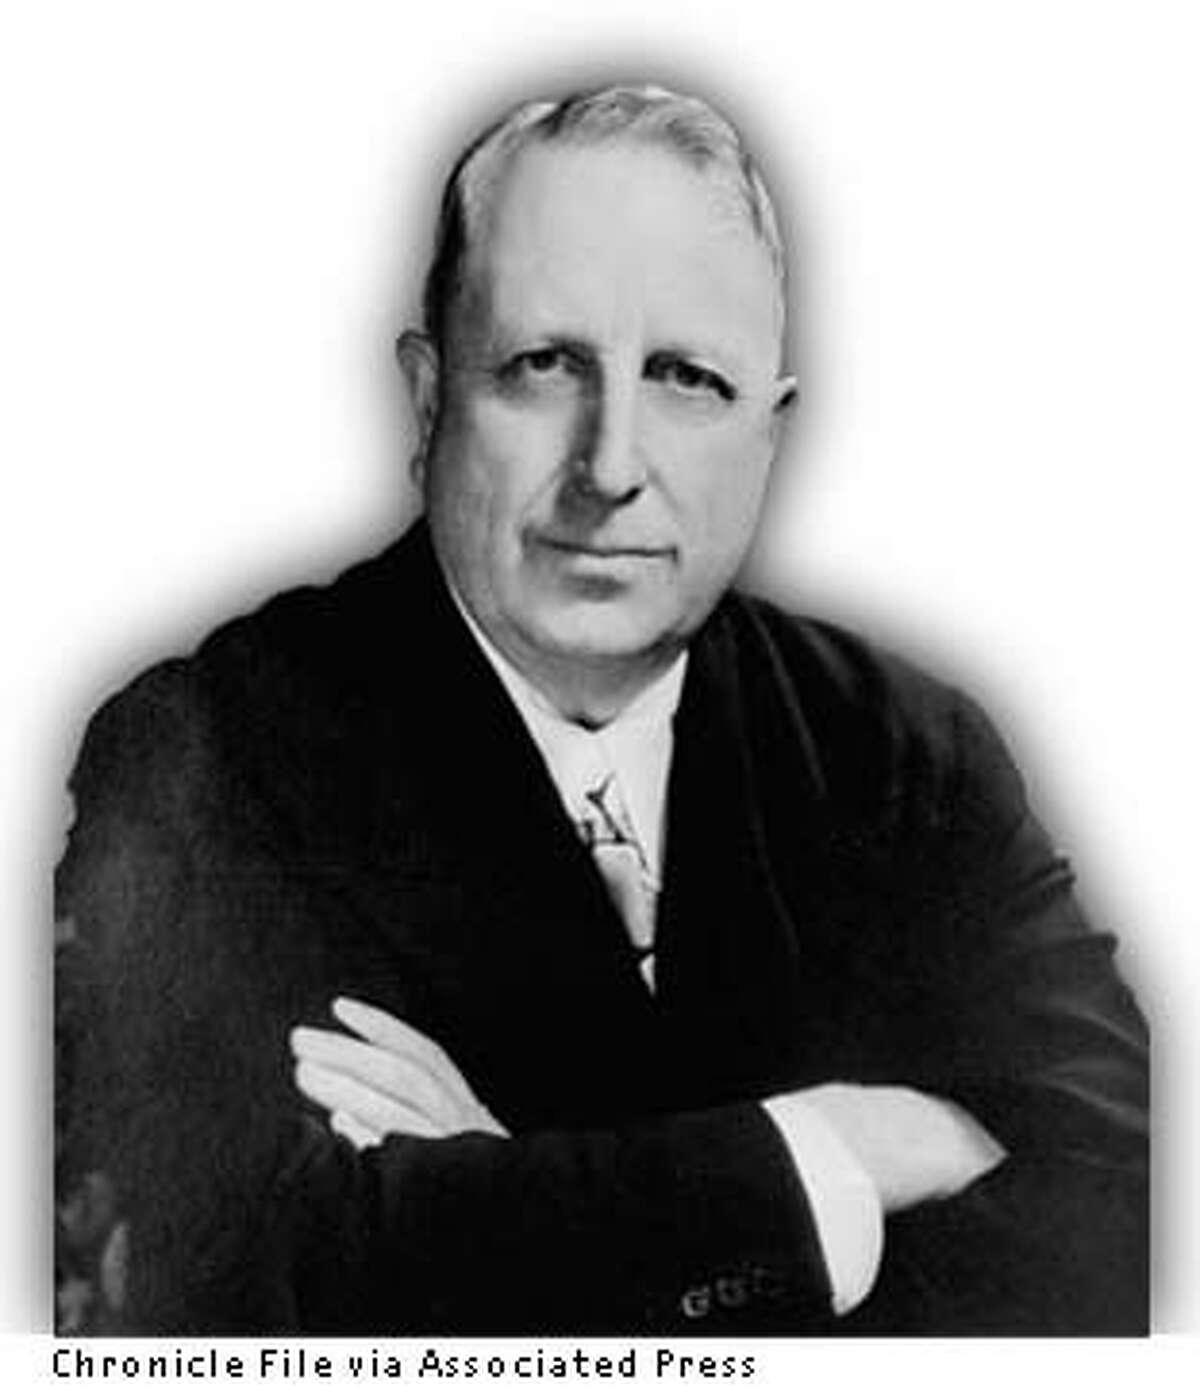 HEARST WM.SR/C/13APR99/MN/AP--A 1935 portrait of William Randolph Hearst, noted American publisher. (AP Photo)